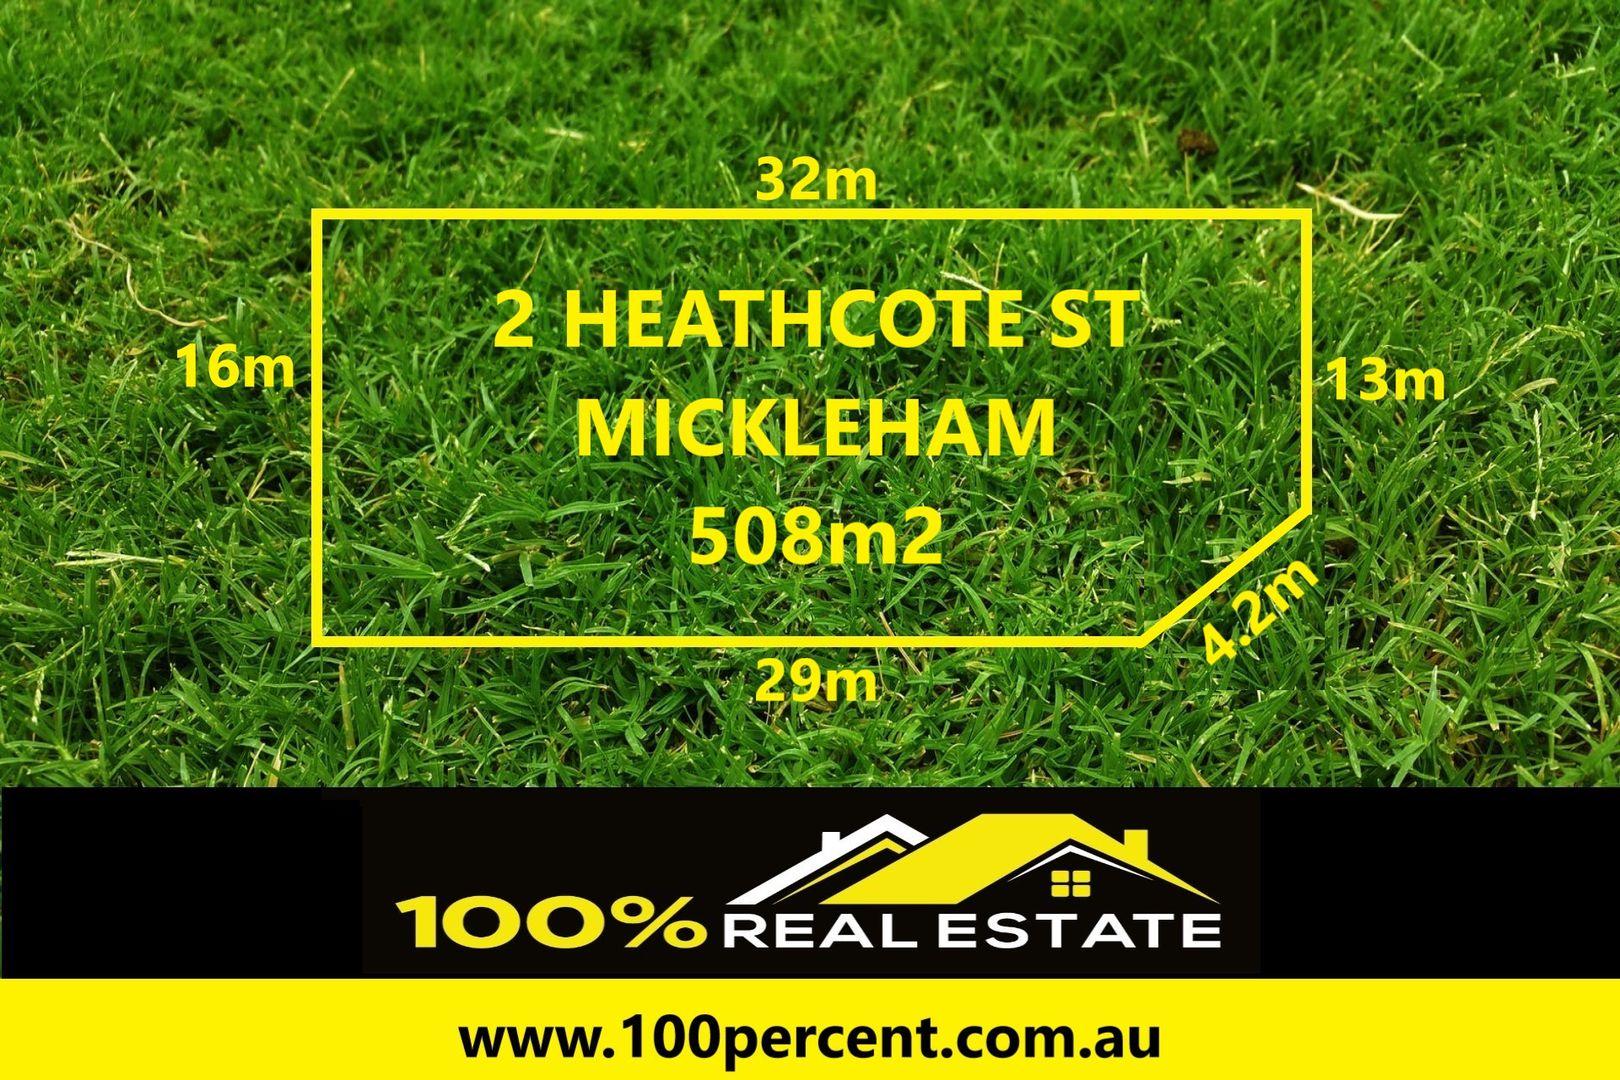 Lot 935 Heathcote Street, Mickleham VIC 3064, Image 0